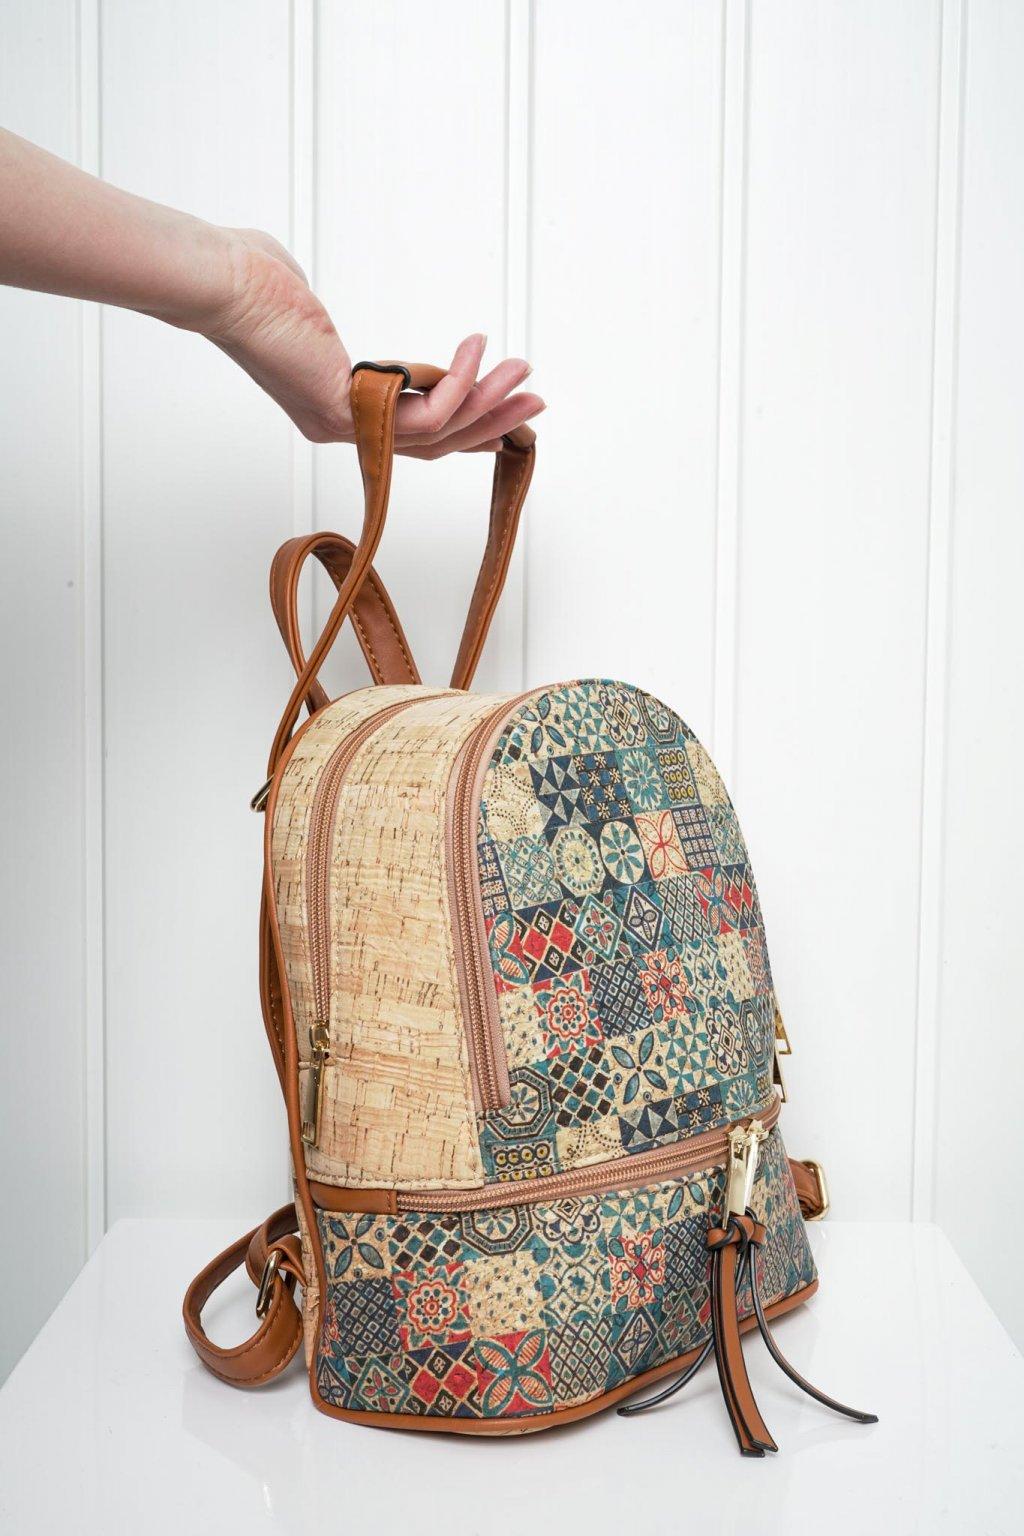 Kabelka, crossbody, ruksak, shopping bag, shopperka, 368